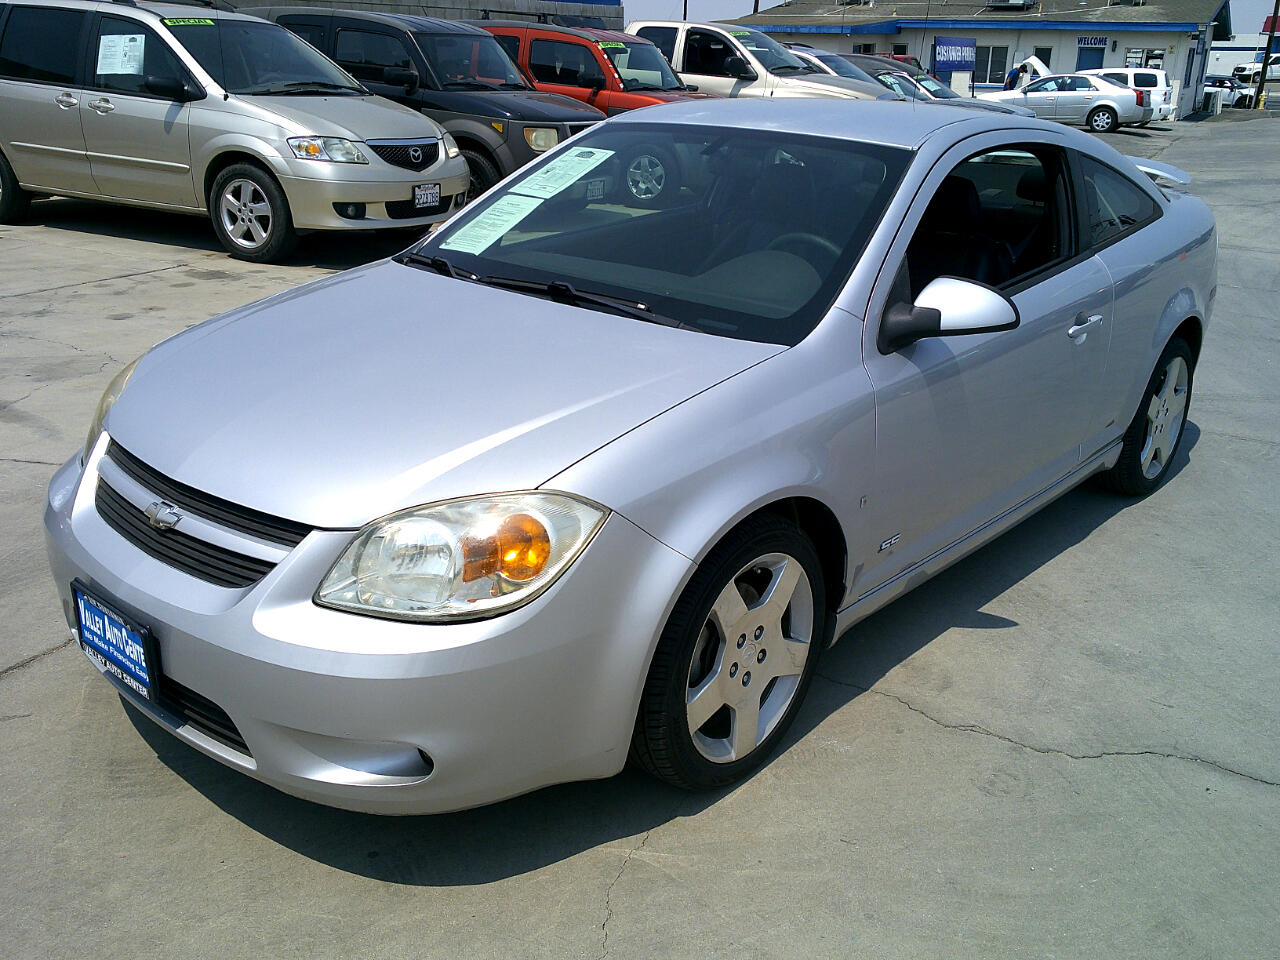 Chevrolet Cobalt SS Coupe 2006